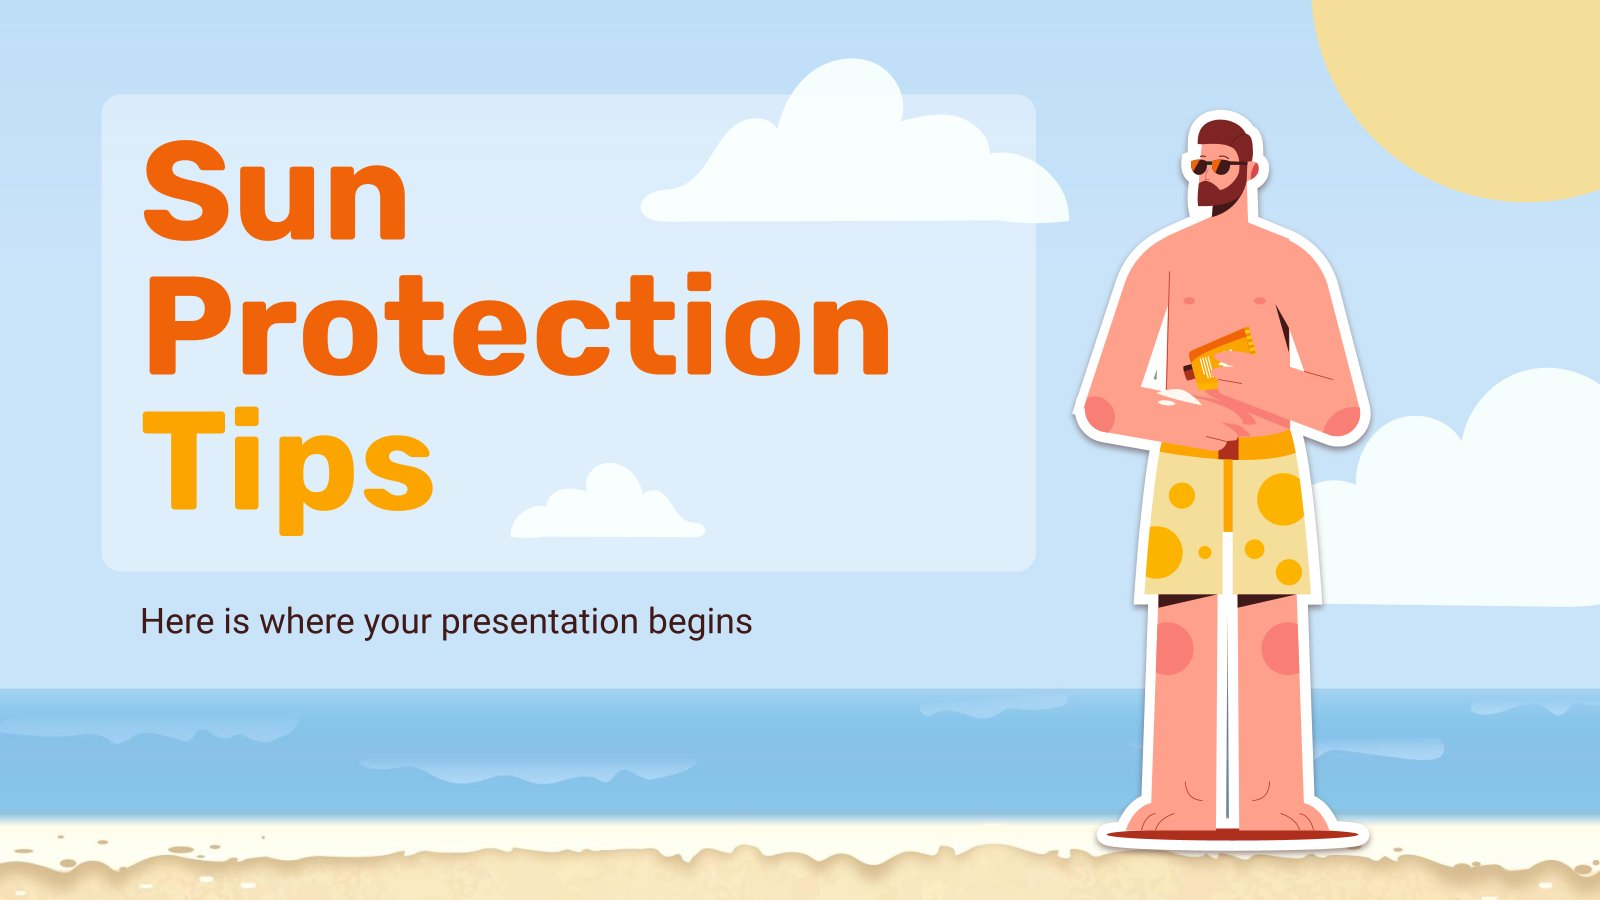 Sun Protection Tips presentation template